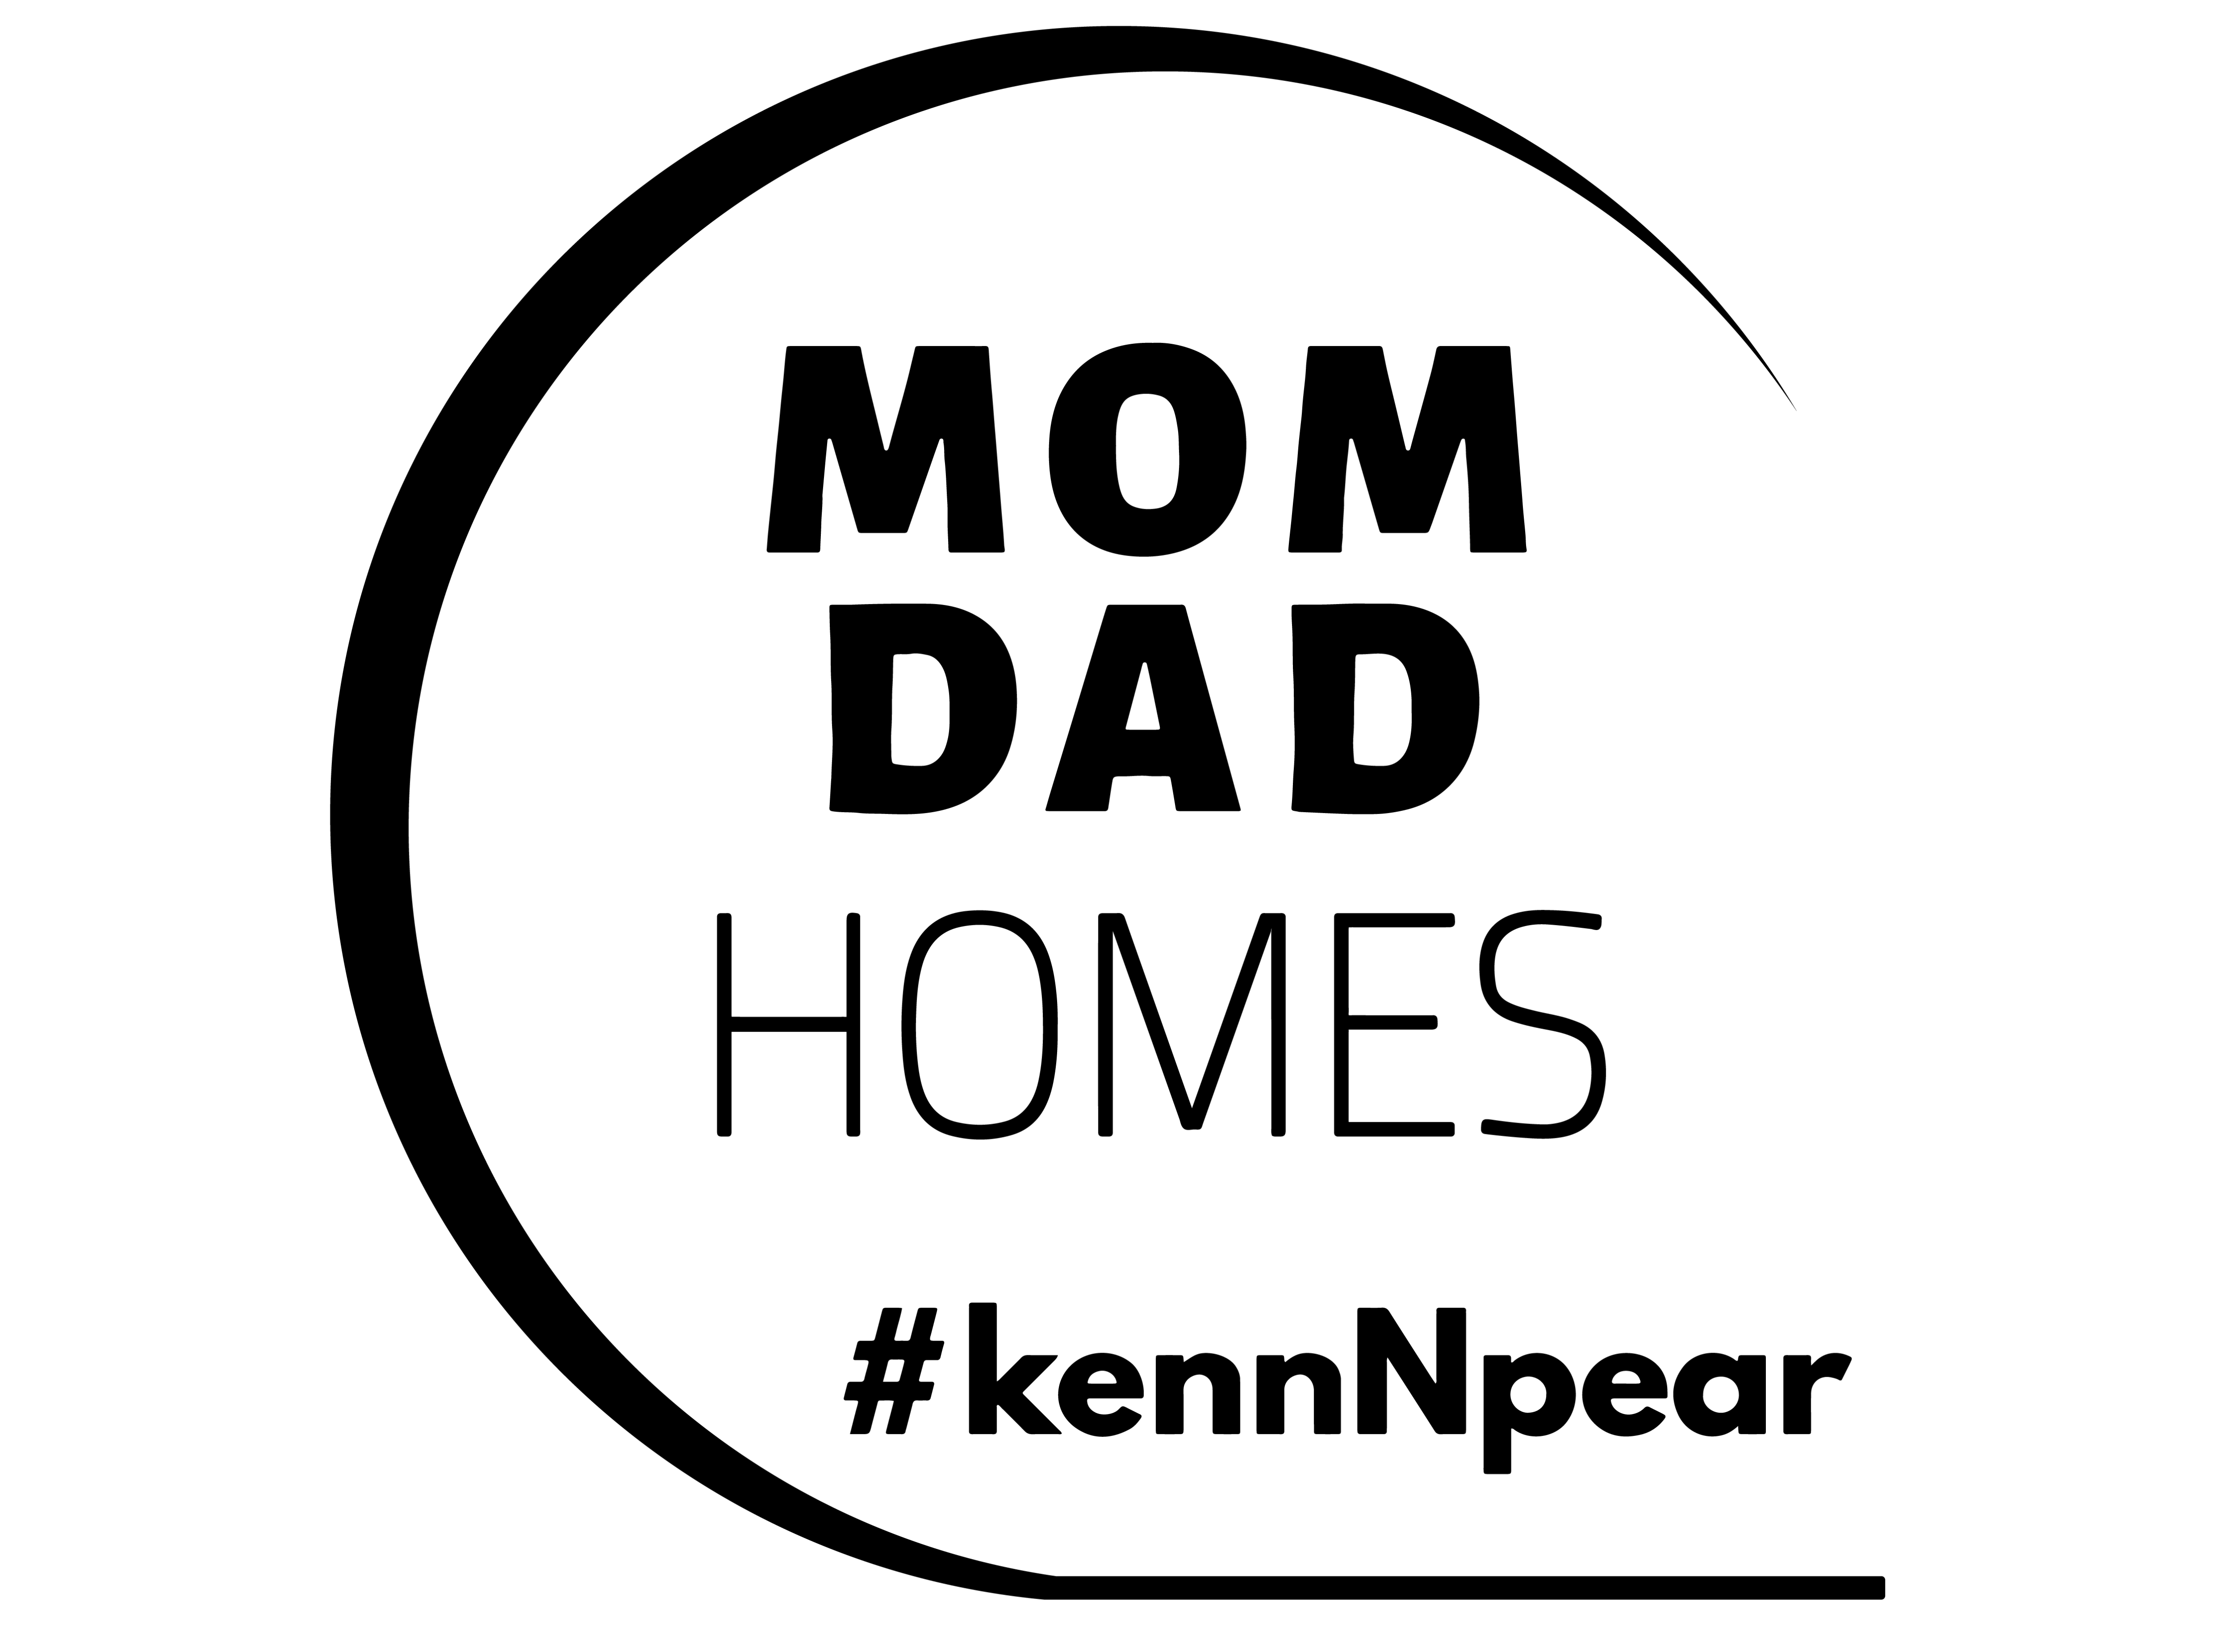 мдиро